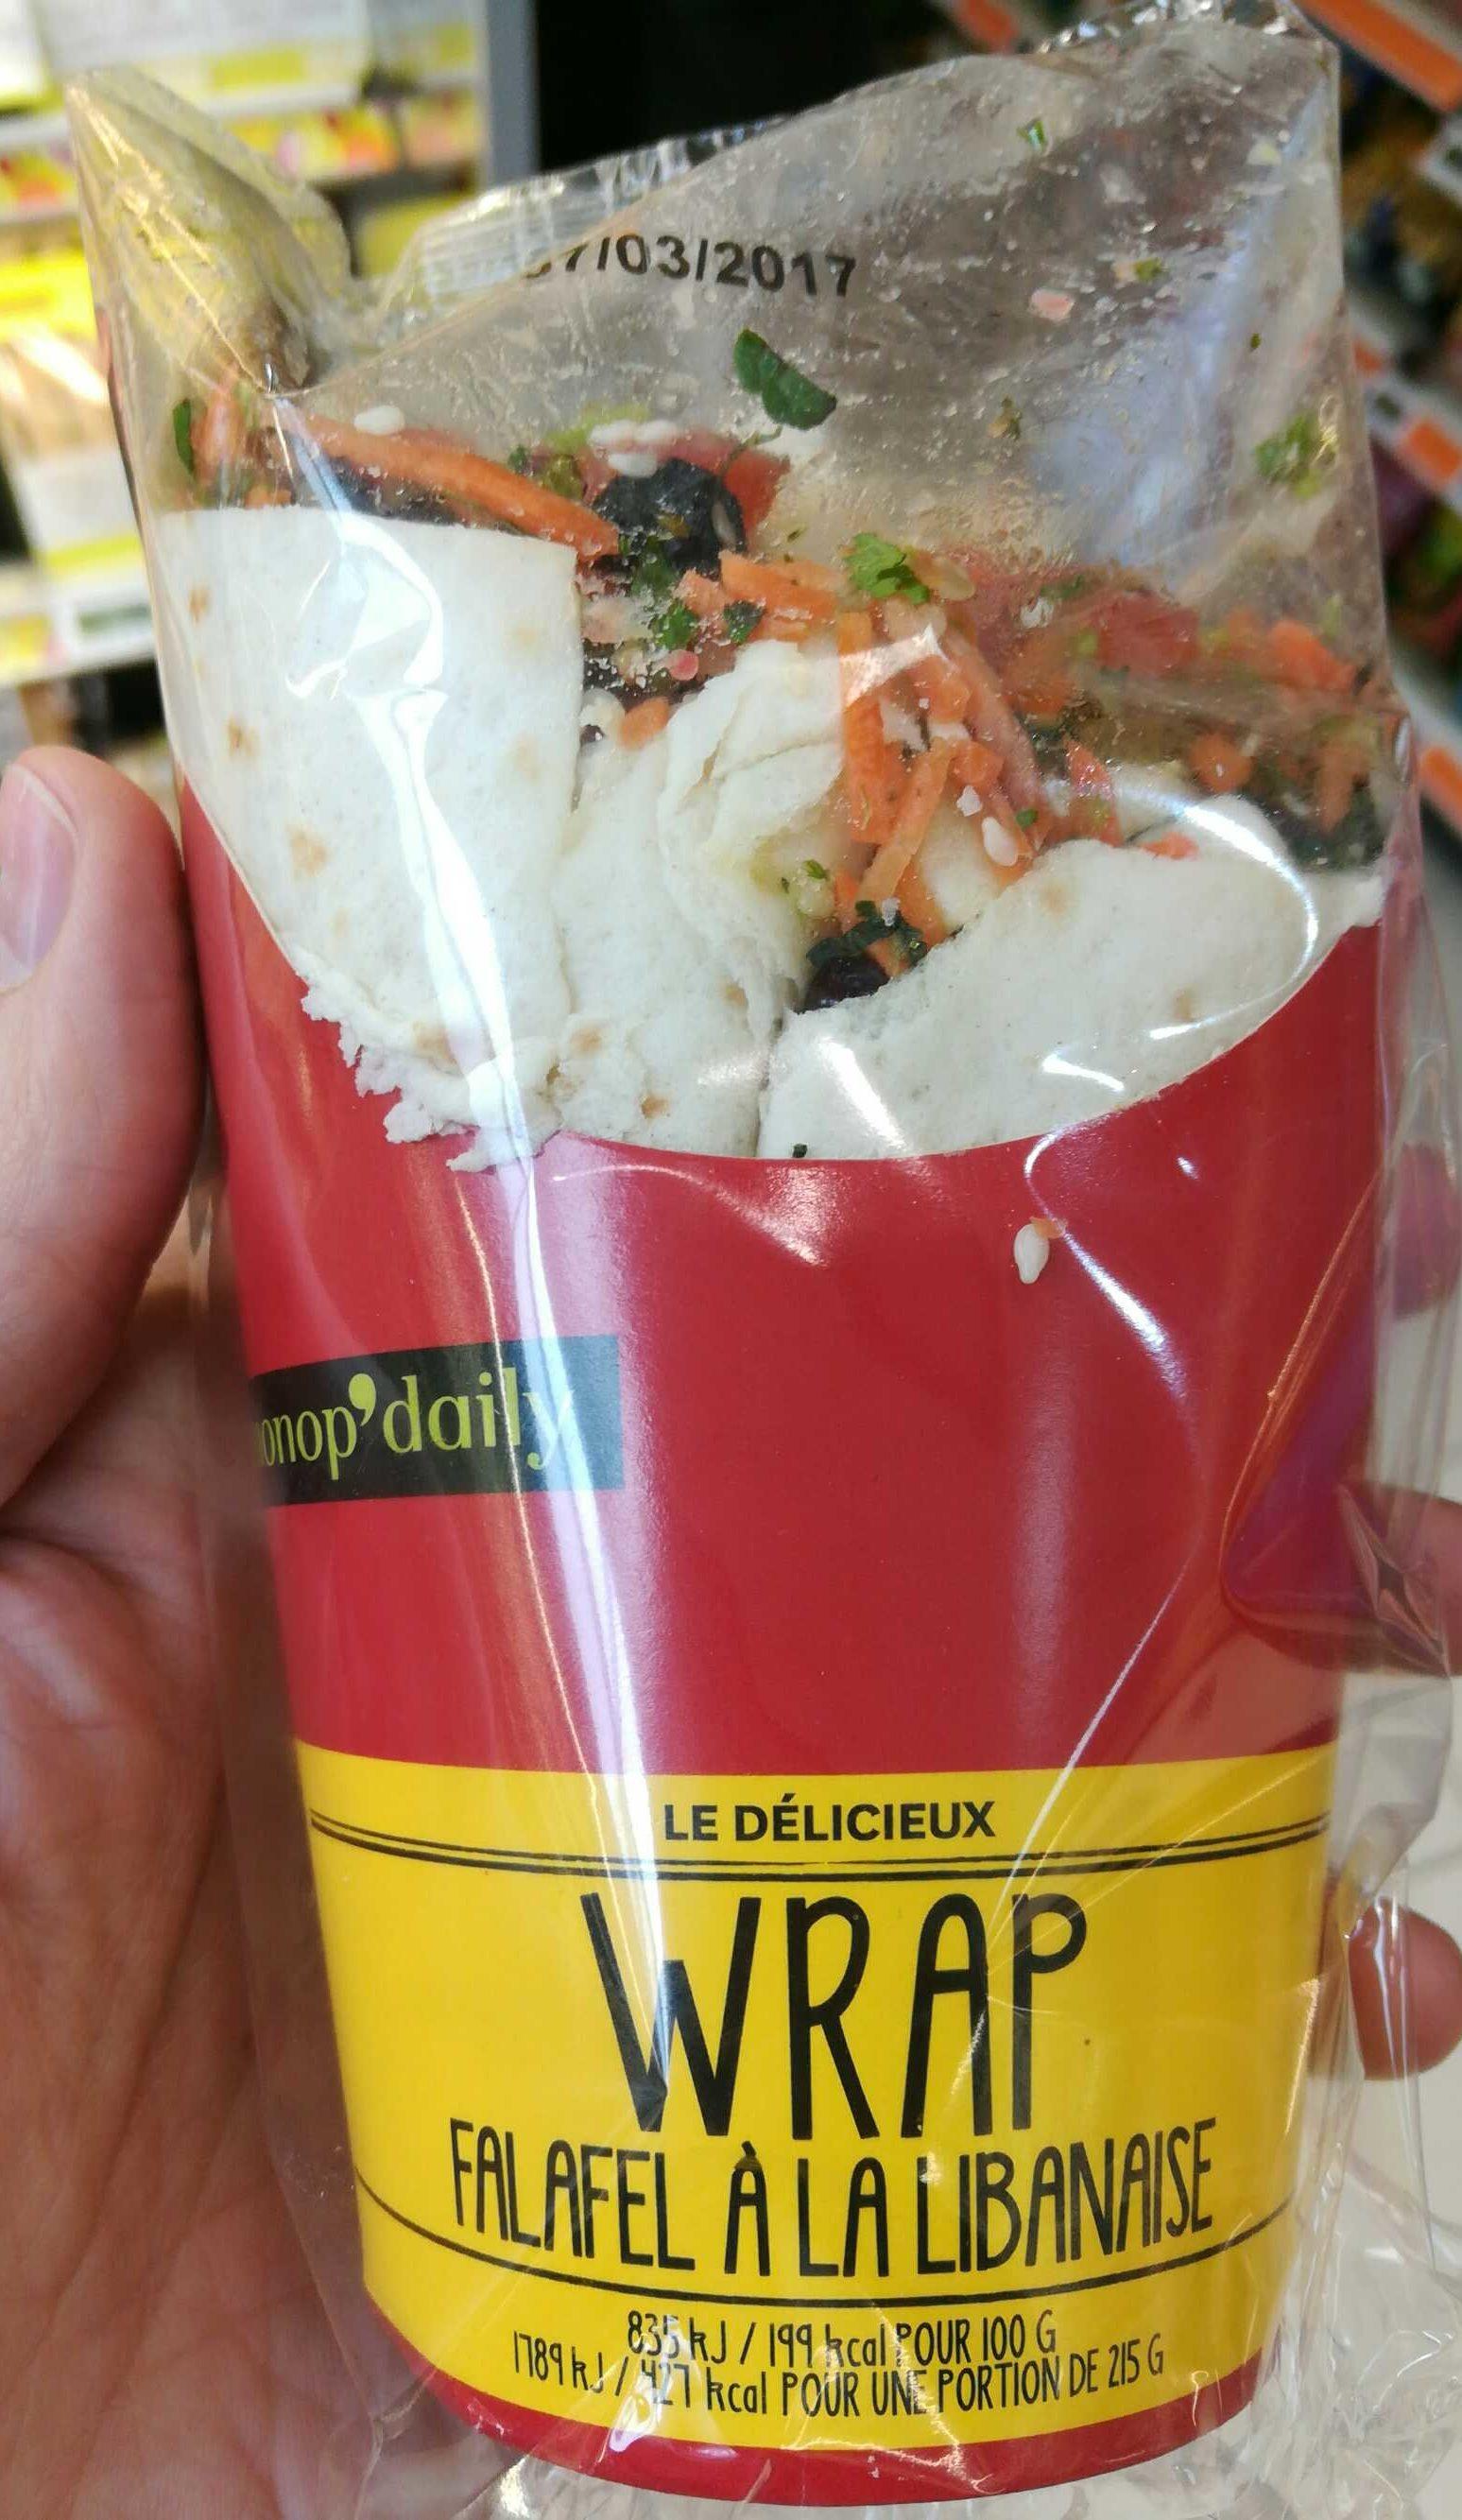 Wrap falafel a la libanaise - Product - fr